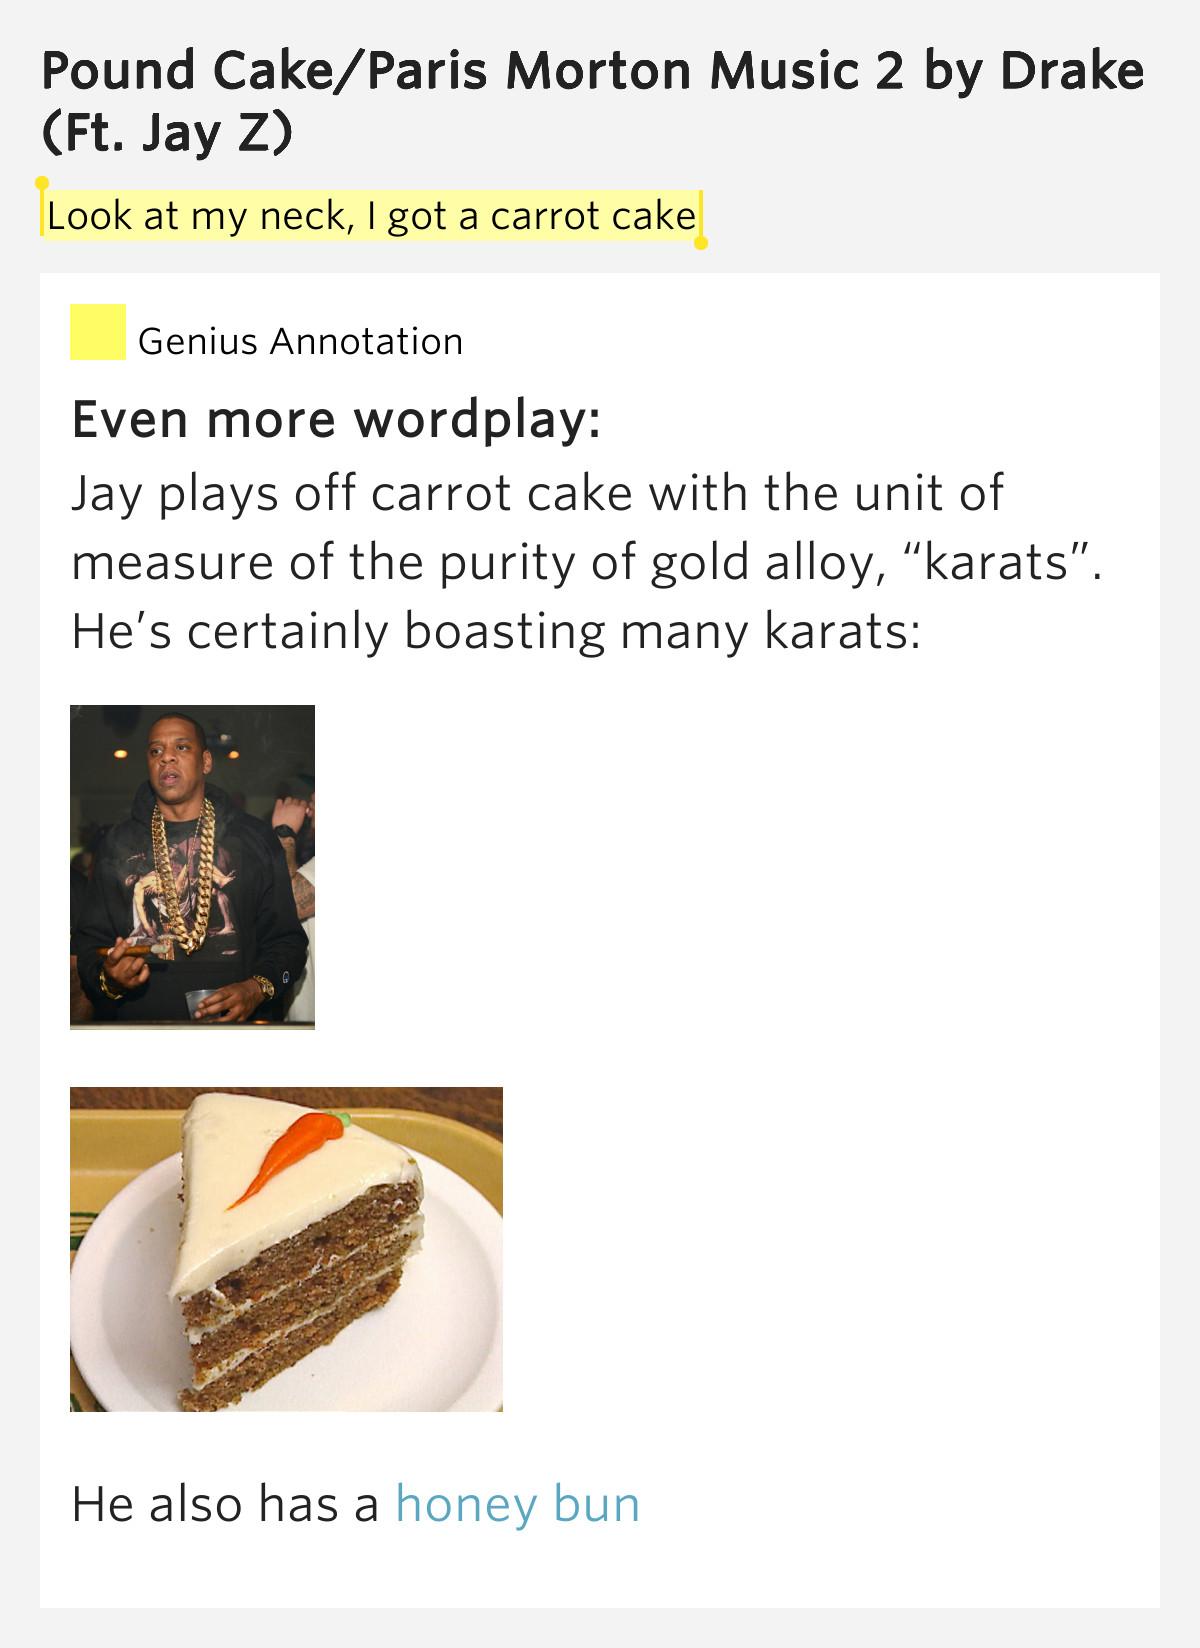 Pound Cake Lyrics  Look at my neck I got a carrot – Pound Cake Paris